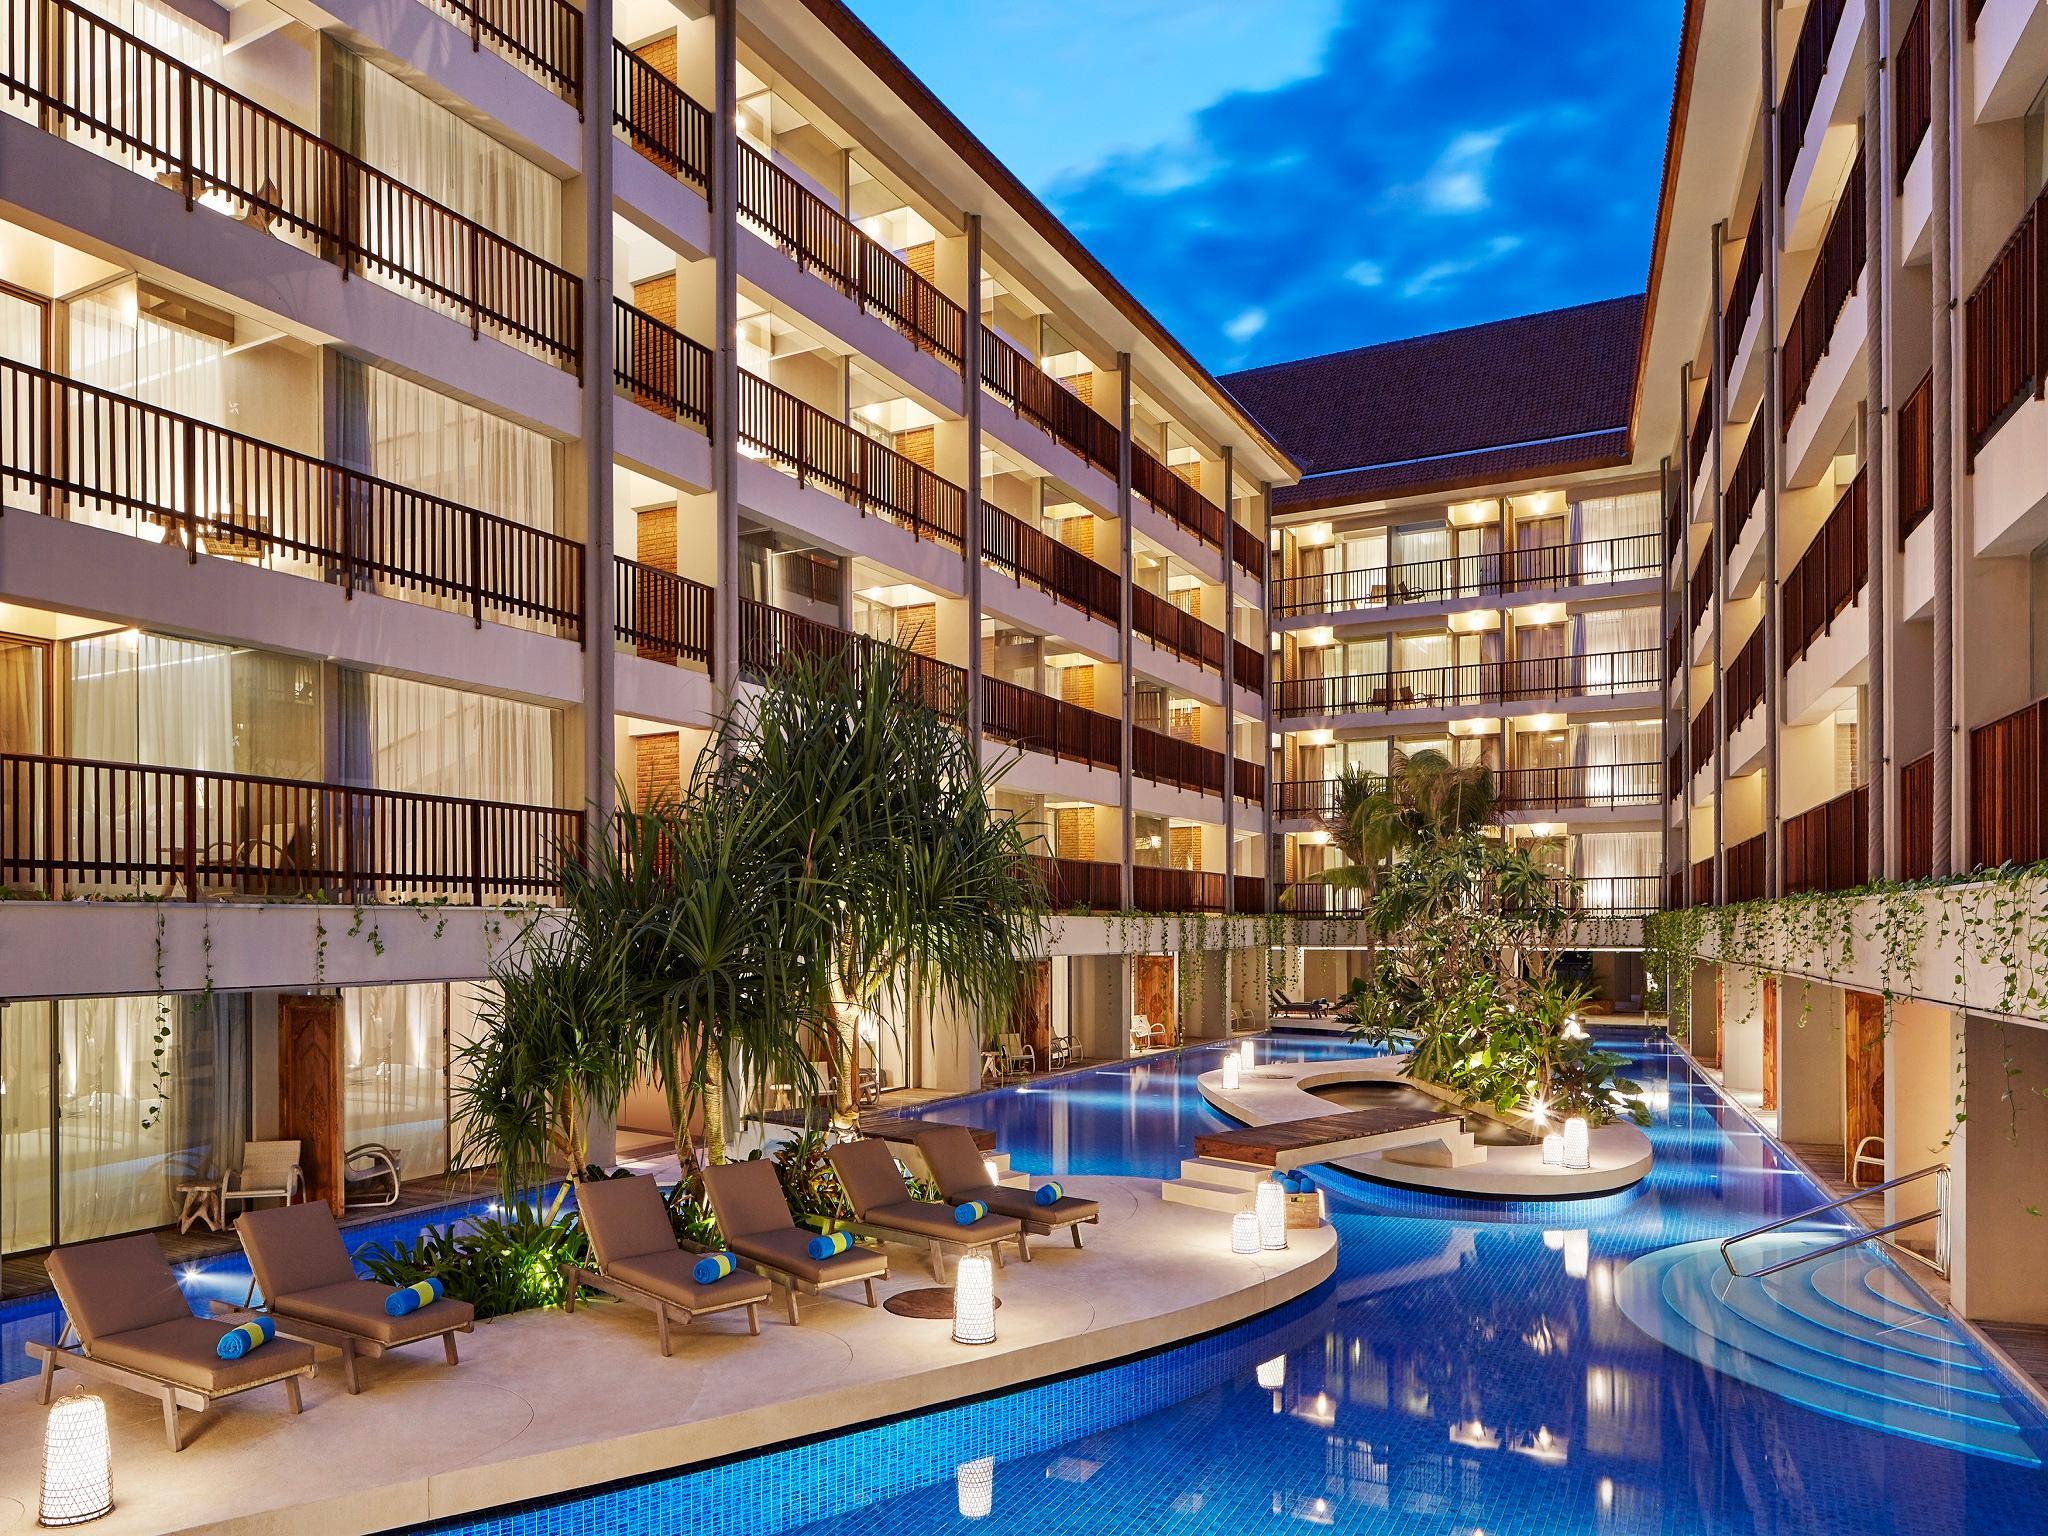 Best Price On Four Points By Sheraton Bali Kuta In Bali